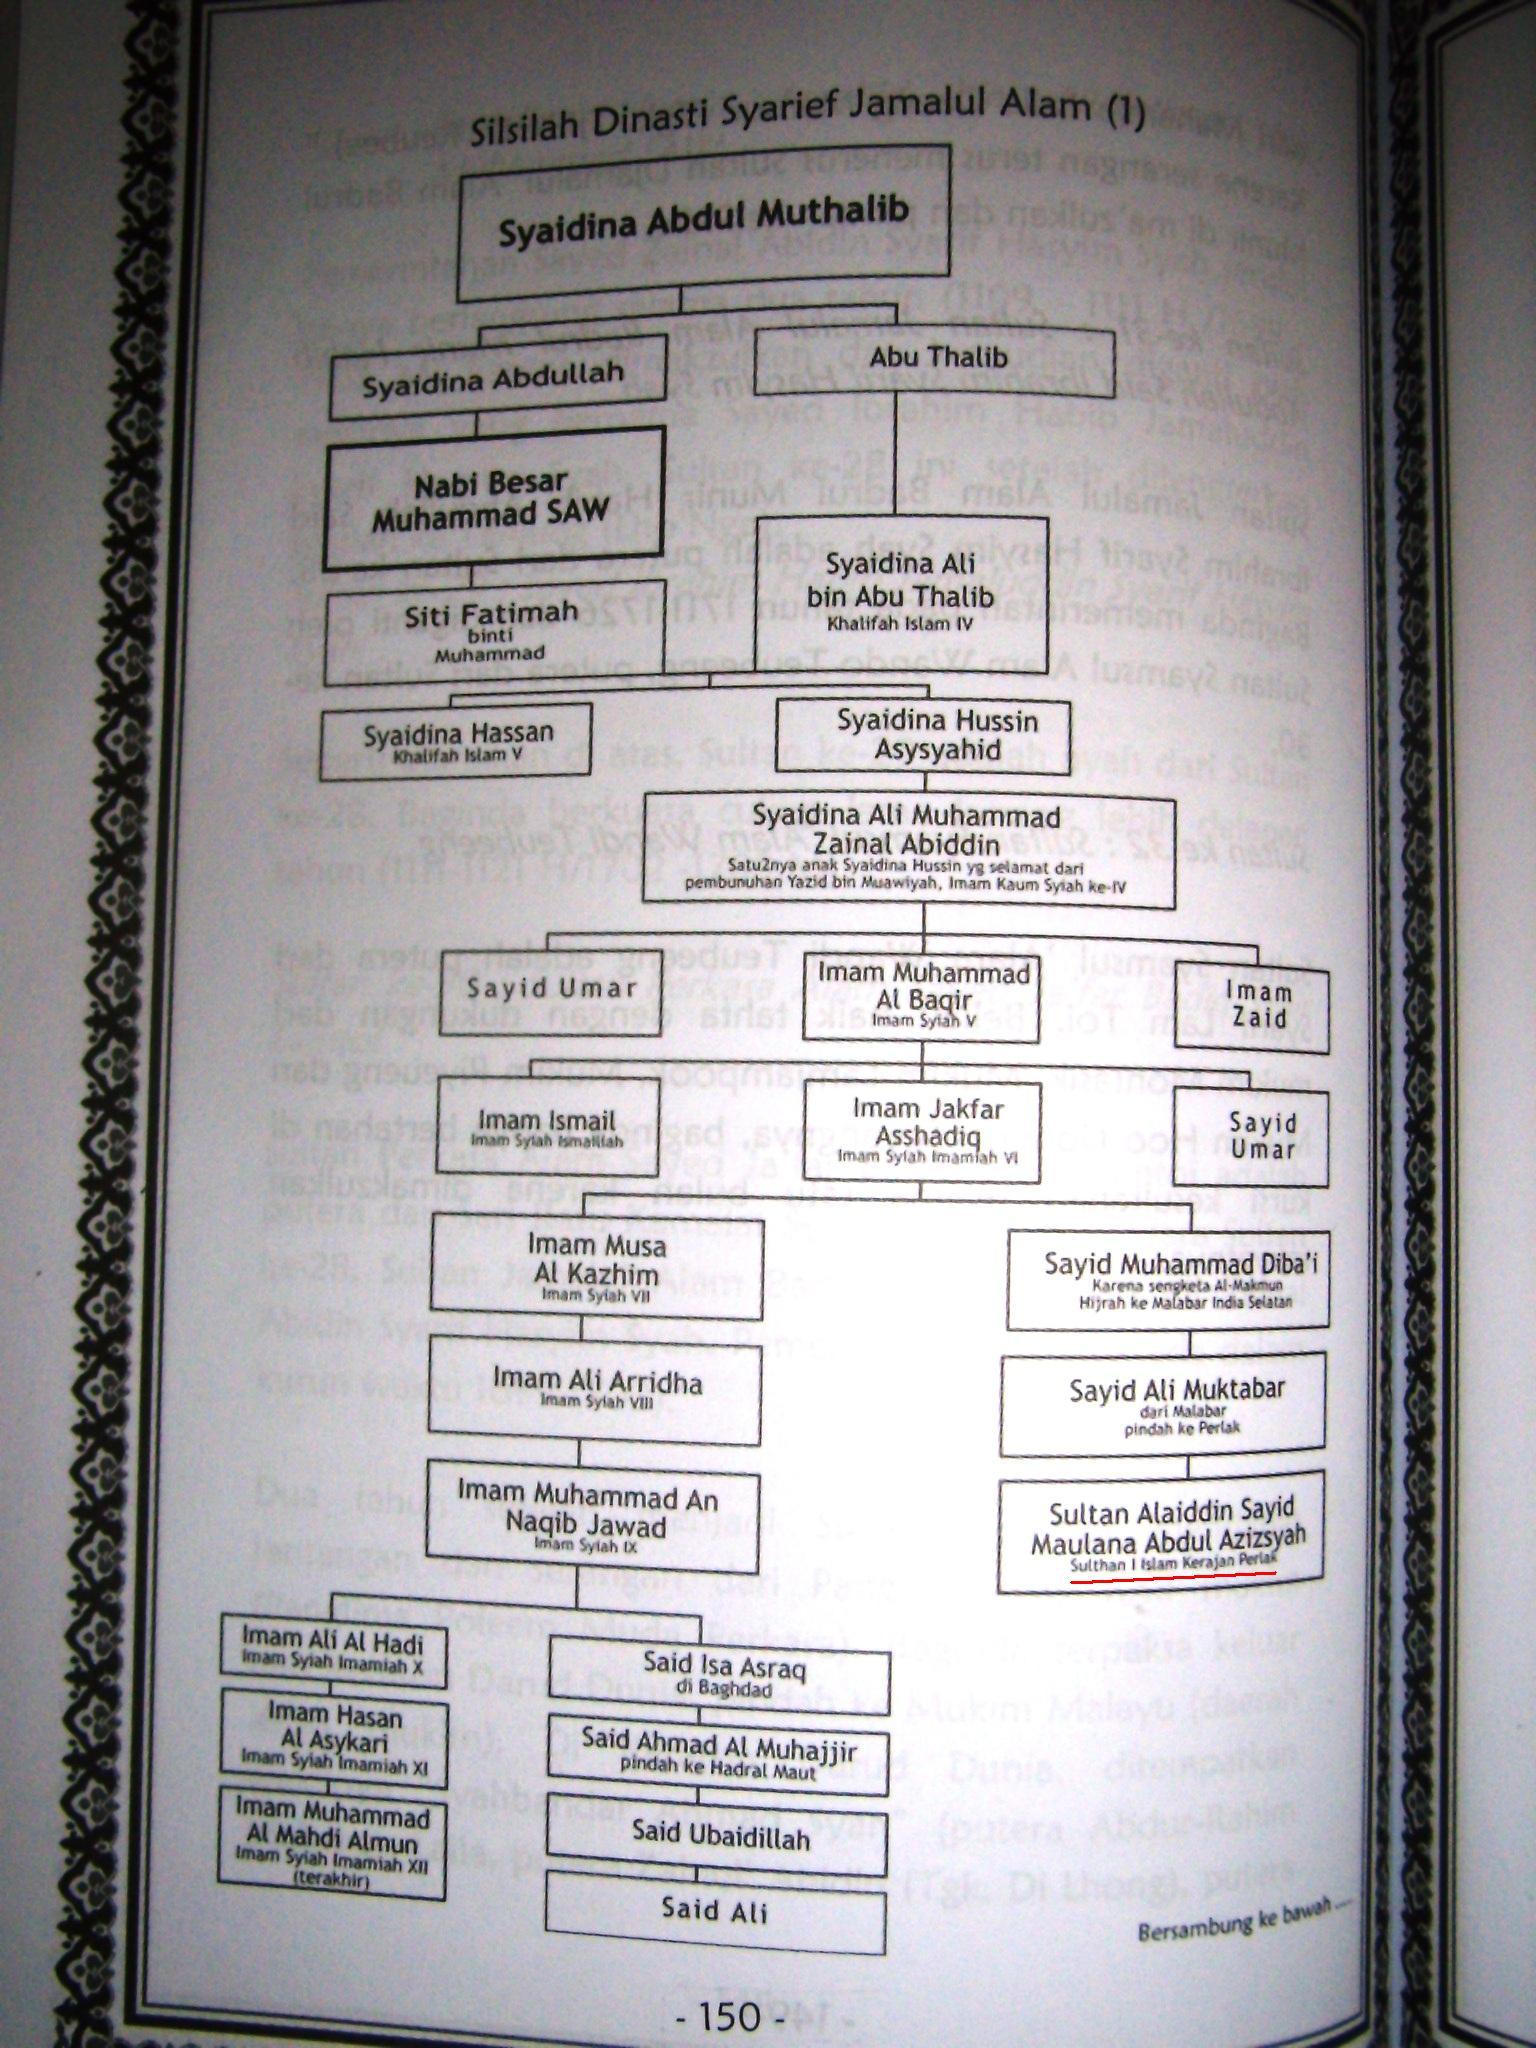 Menelisik silsilah raja raja islam di aceh orekan waktu luang silsilah dinasti syarief jamalul alam 1 ccuart Images